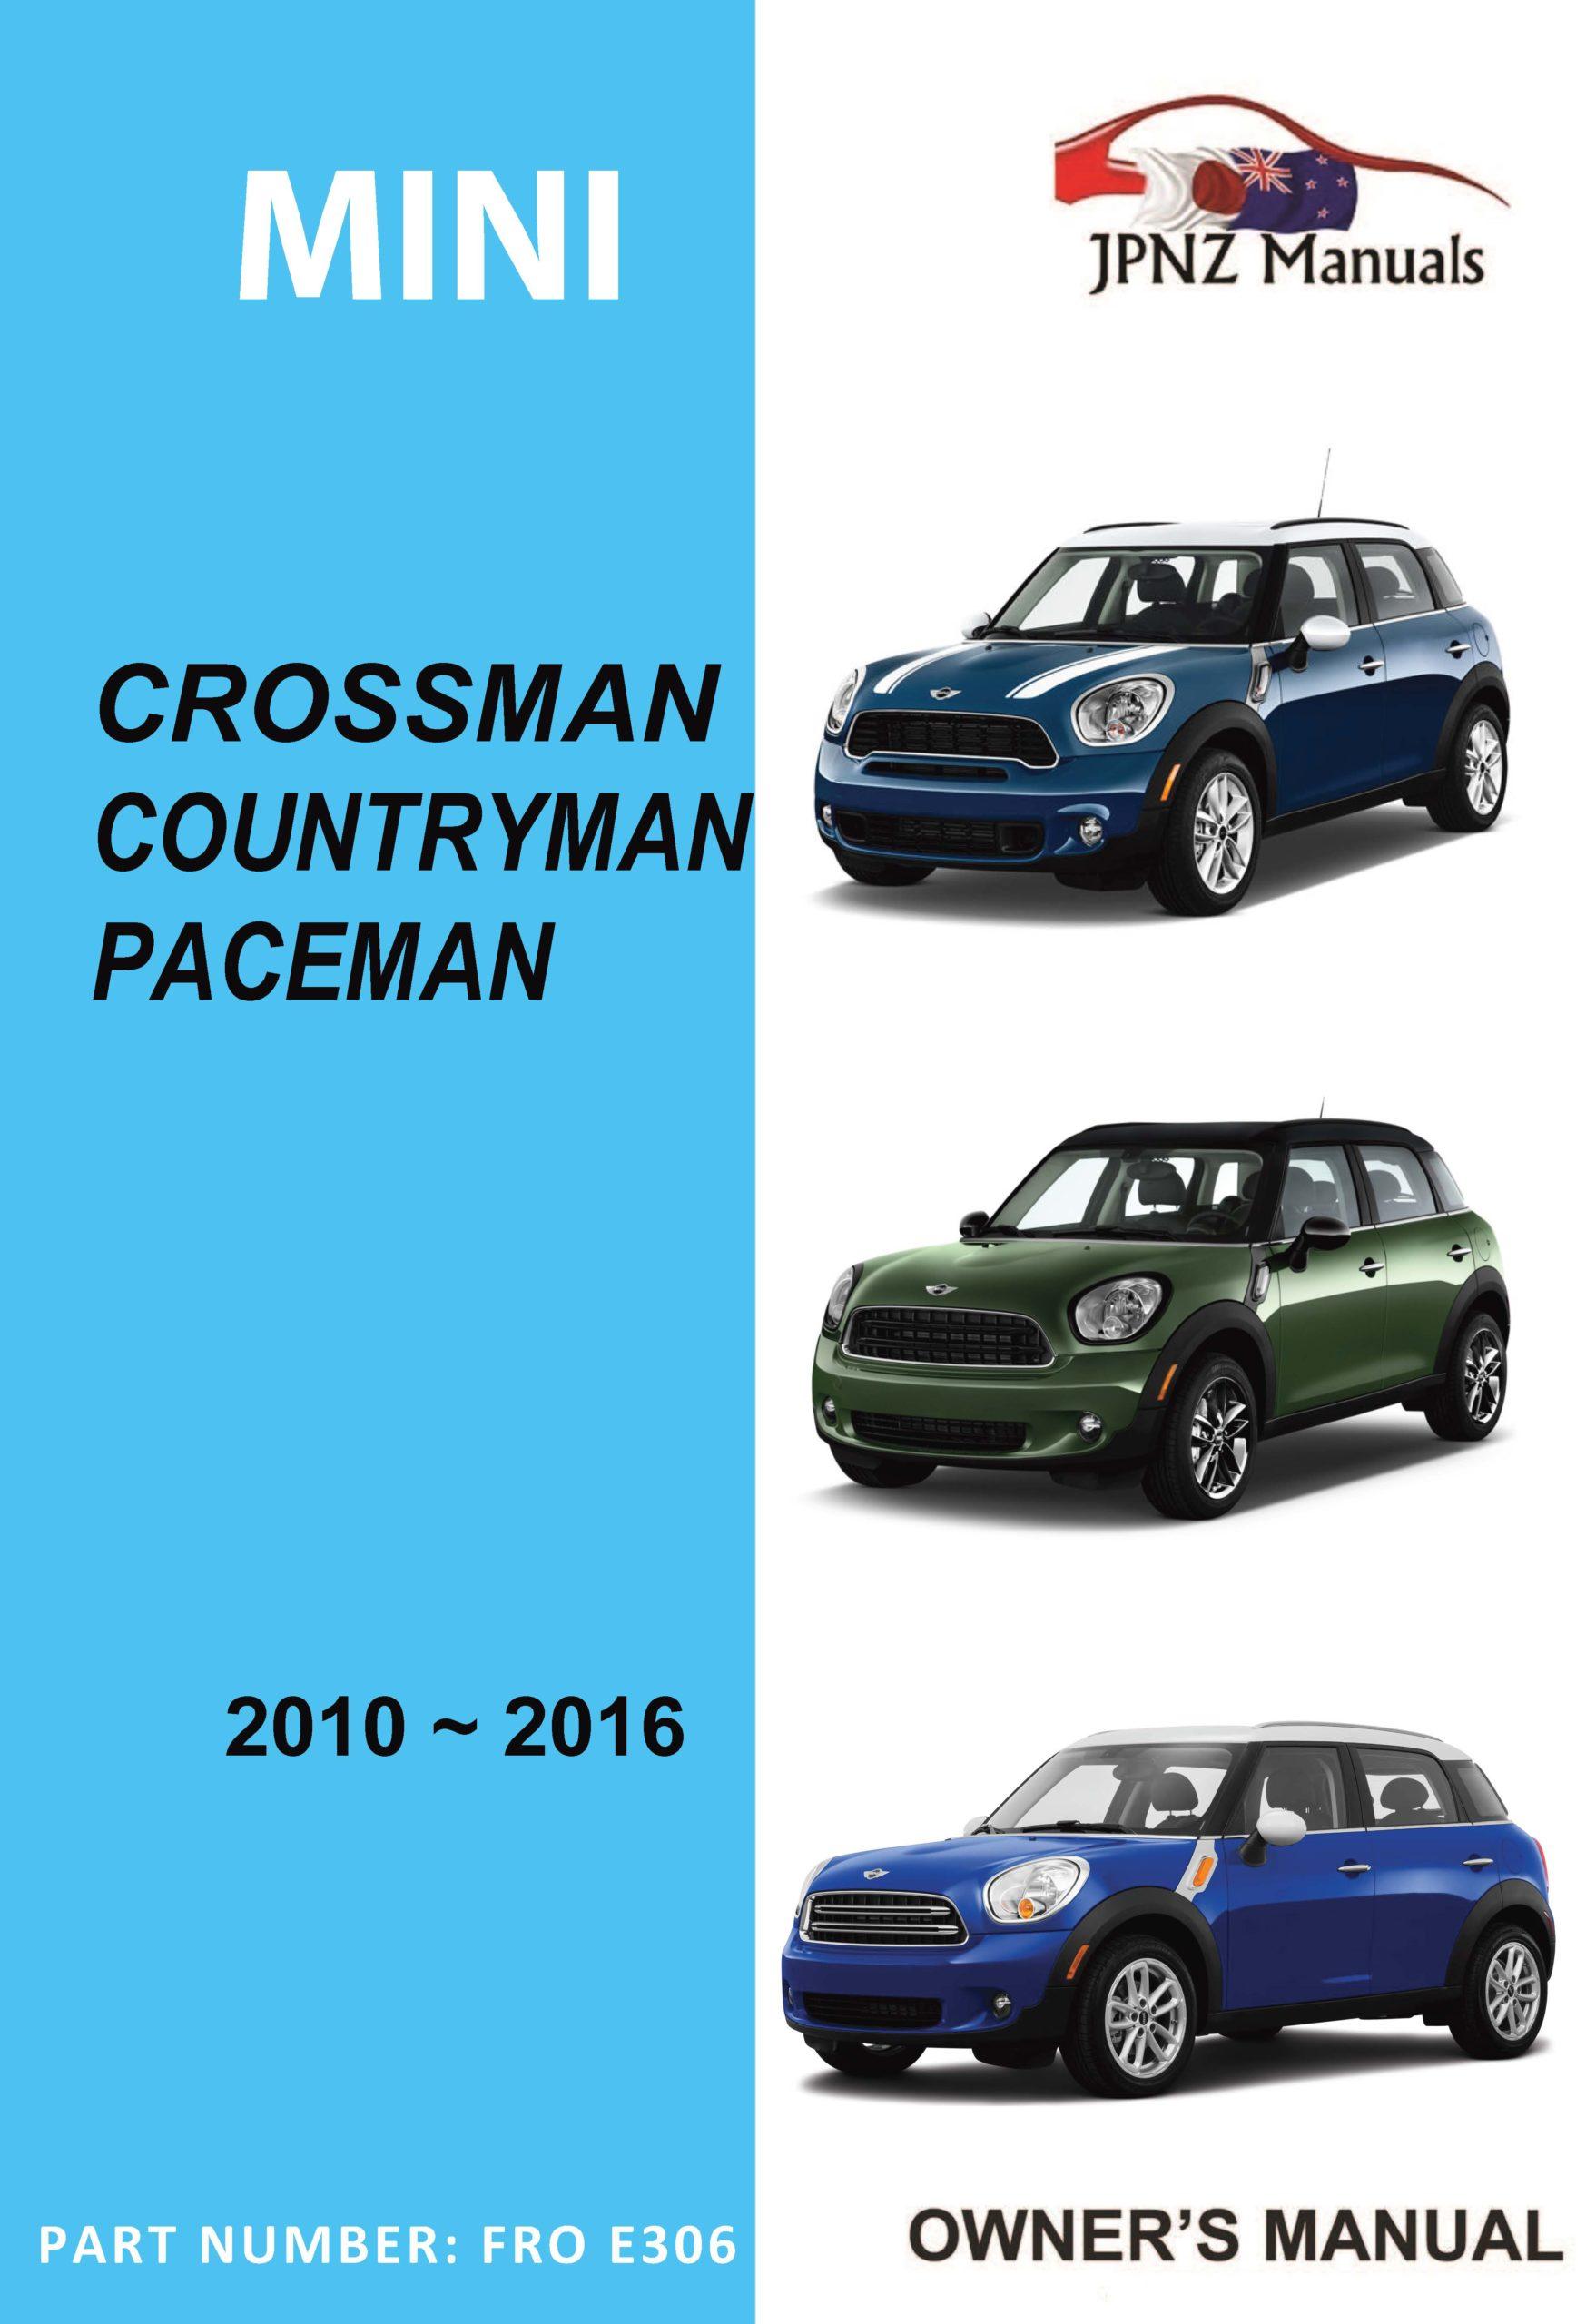 Mini - Crossman - Countryman - Paceman car owners user manual in English   2010 - 2016